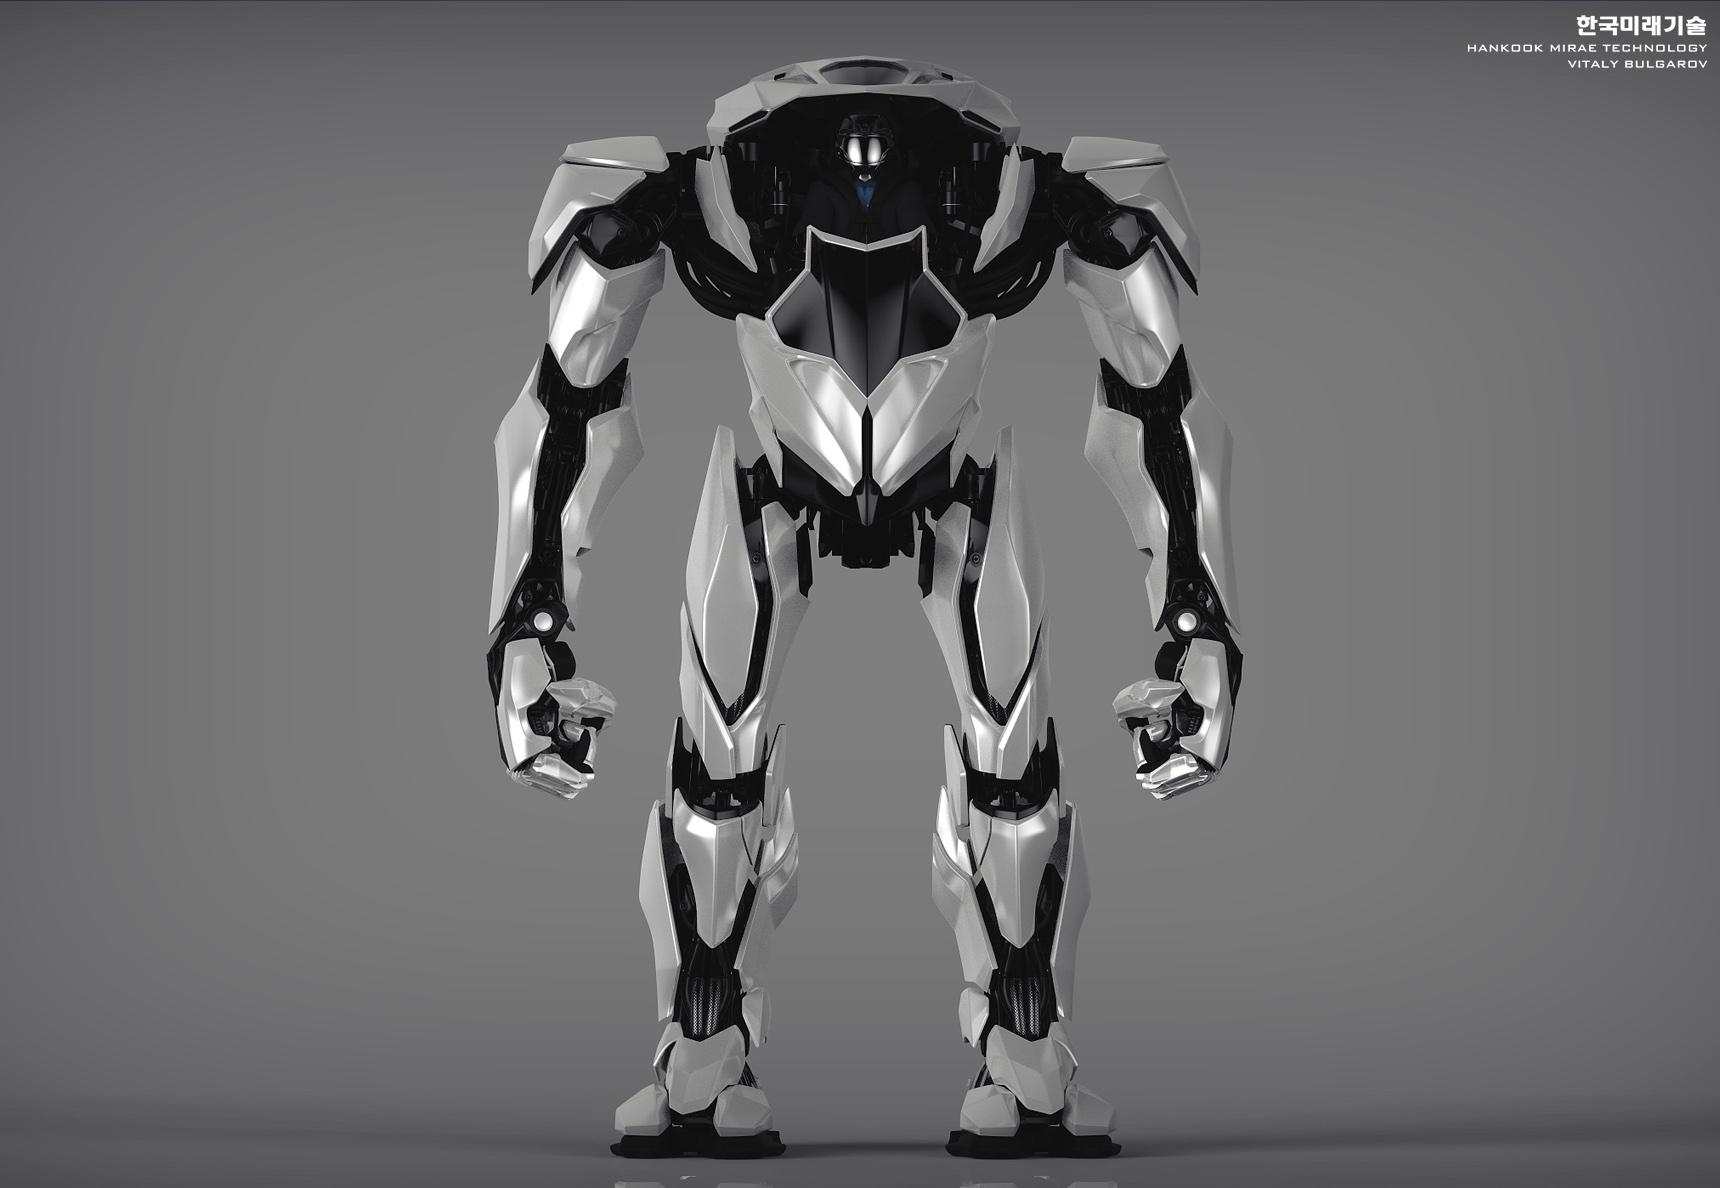 HankookMiraeTechnology_ProjectMethod_InitialDesigns_07.jpg